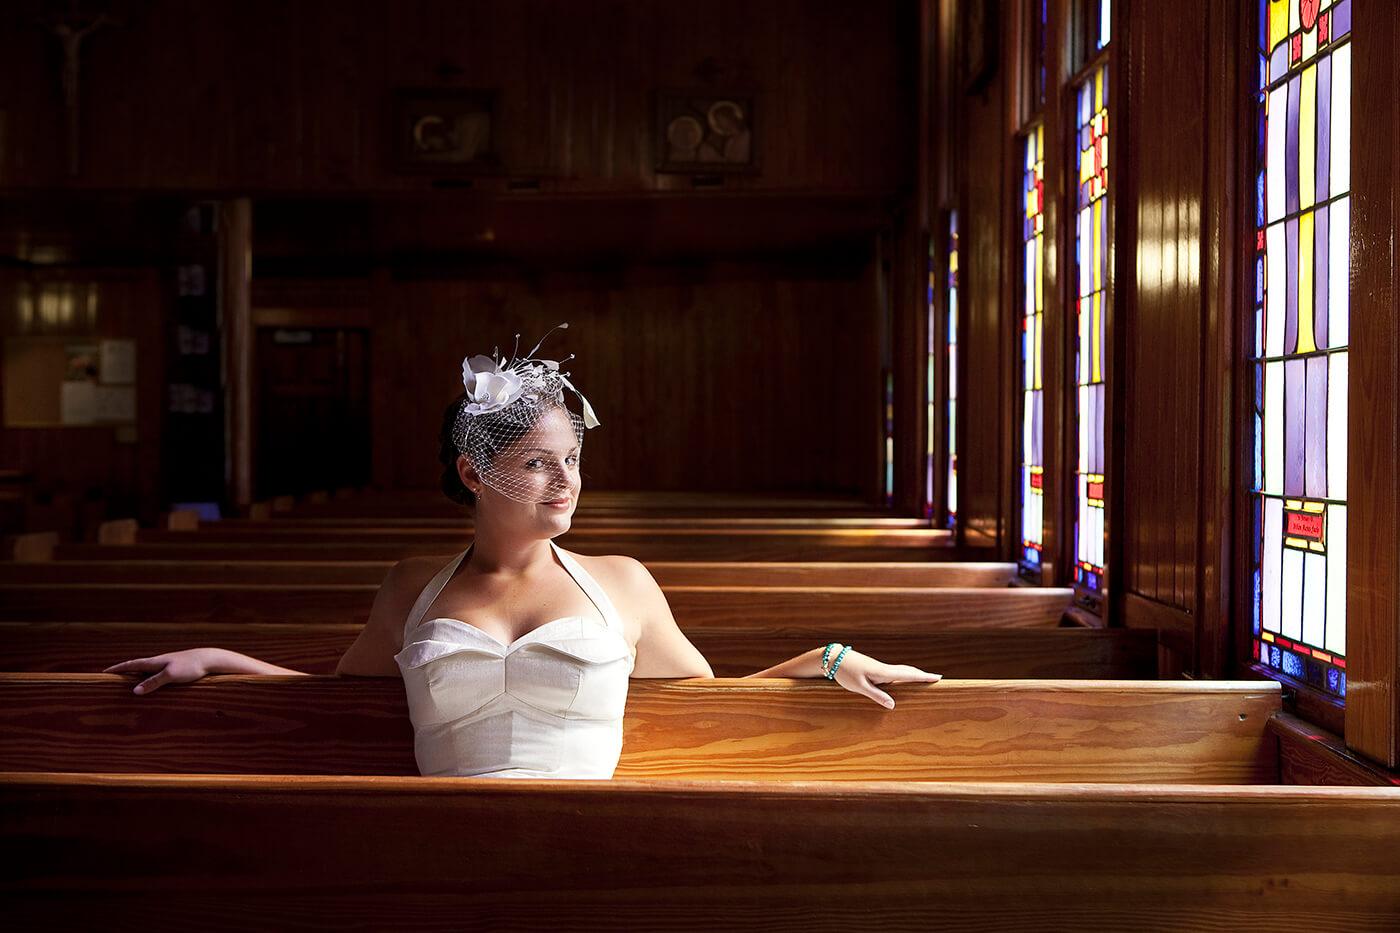 Wedding_Bridal_Photographer_Austin_Texas_Dennis_Burnett_18